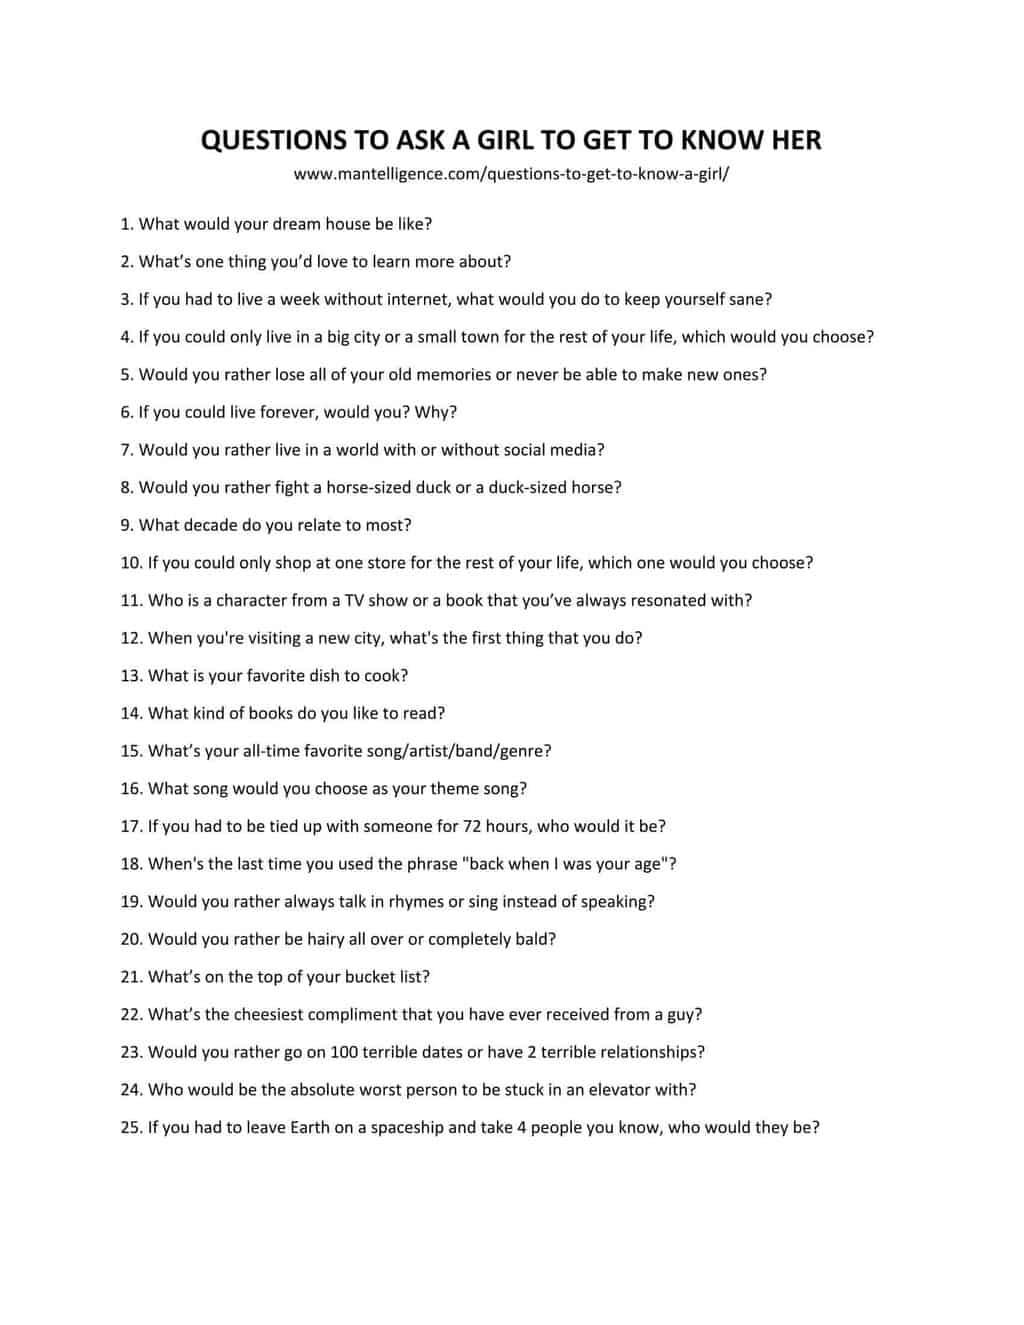 Icq chat 40 something